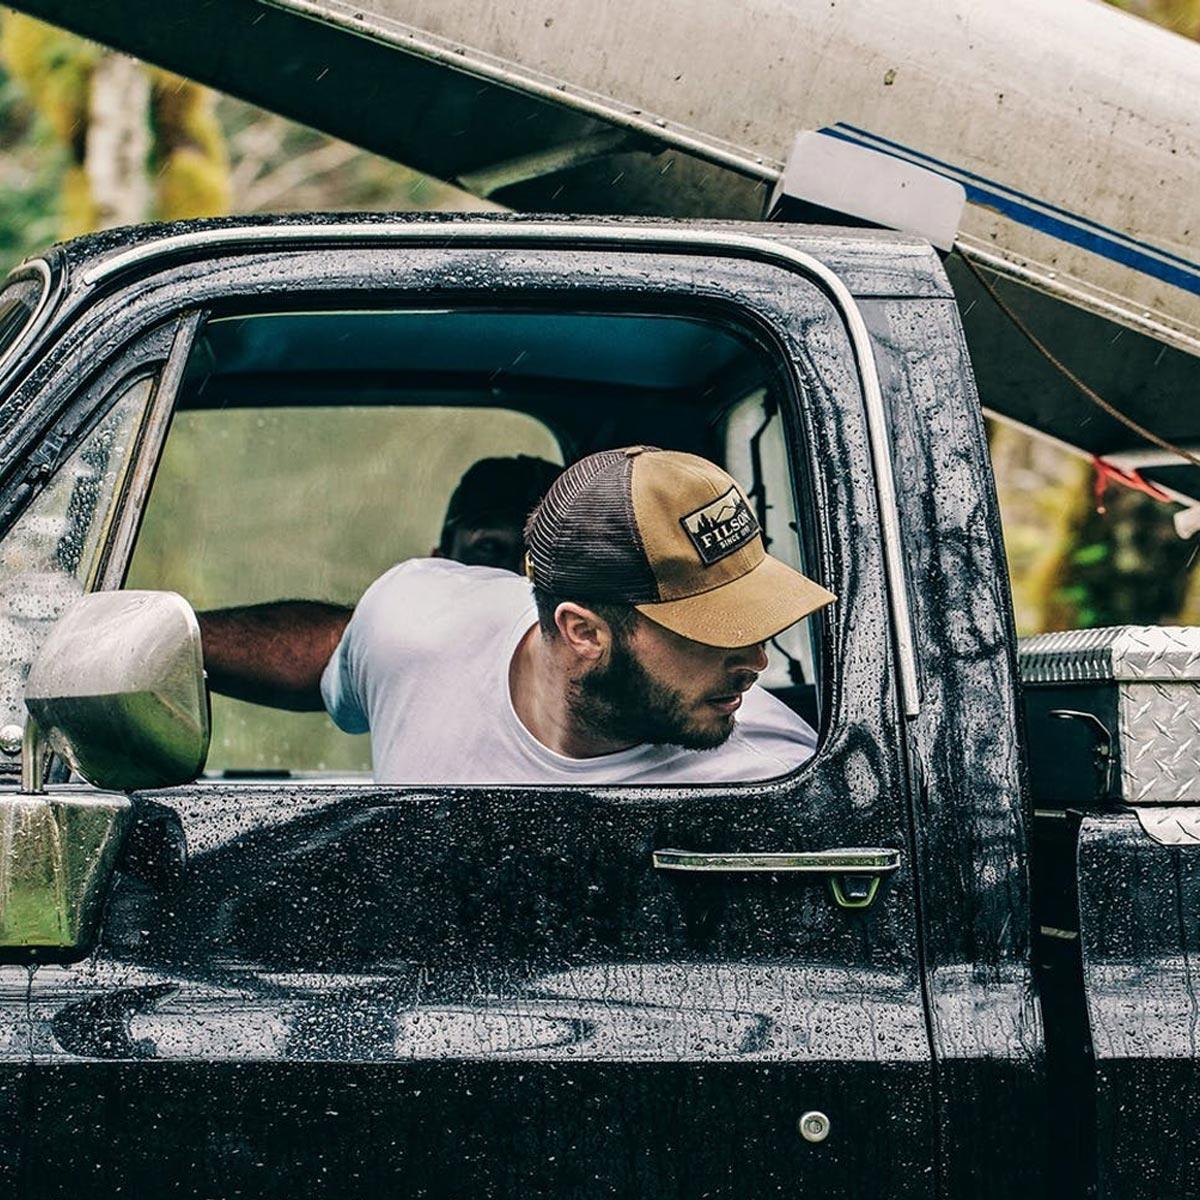 Filson Logger Mesh Cap 11030237-Dark Tan, durable cap made of iconic, water-repellent Tin Cloth